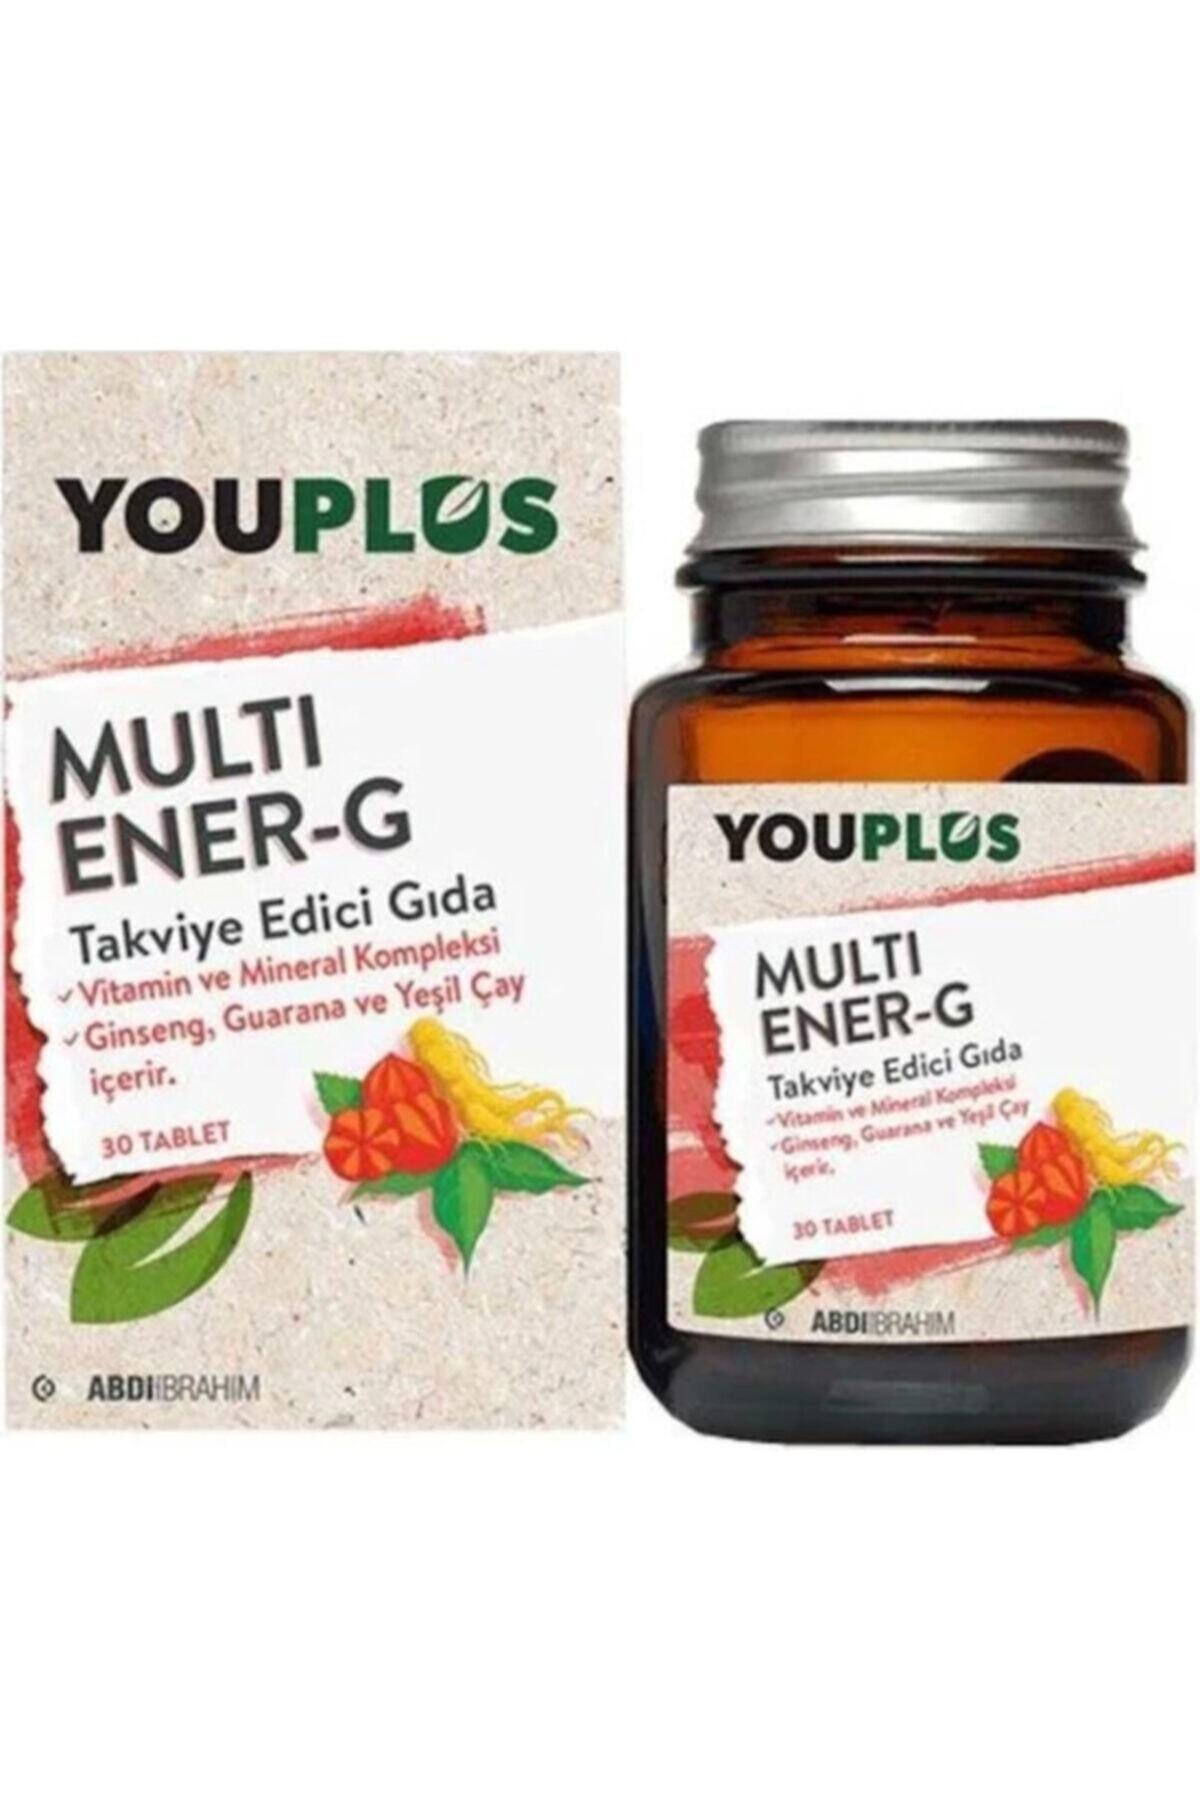 Youplus Multi Ener-g Multivitamin 30 Tablet-1 Adet 1